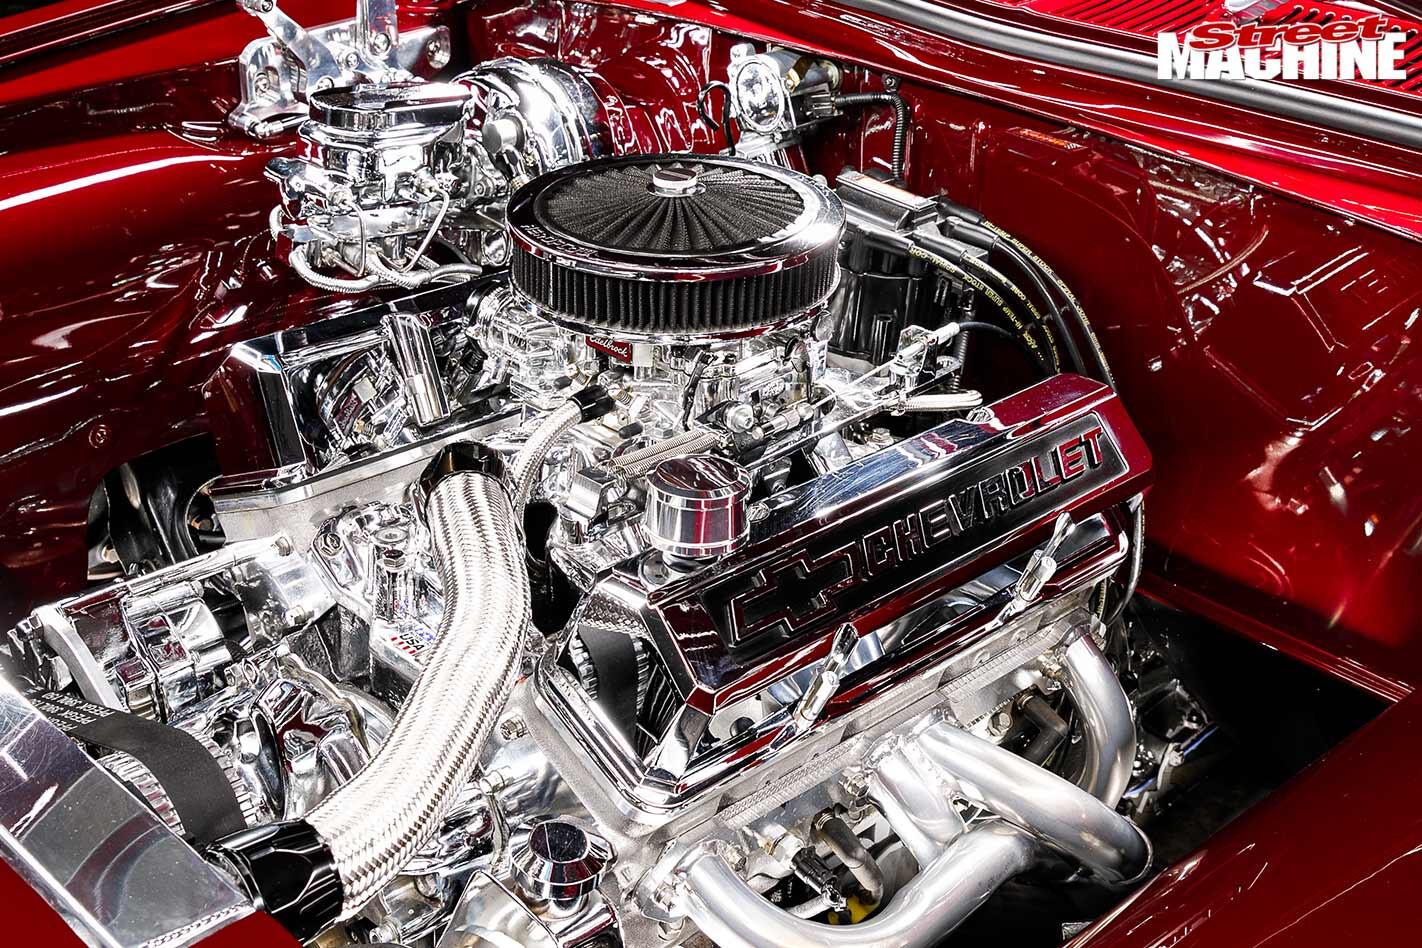 Holden HQ engine bay